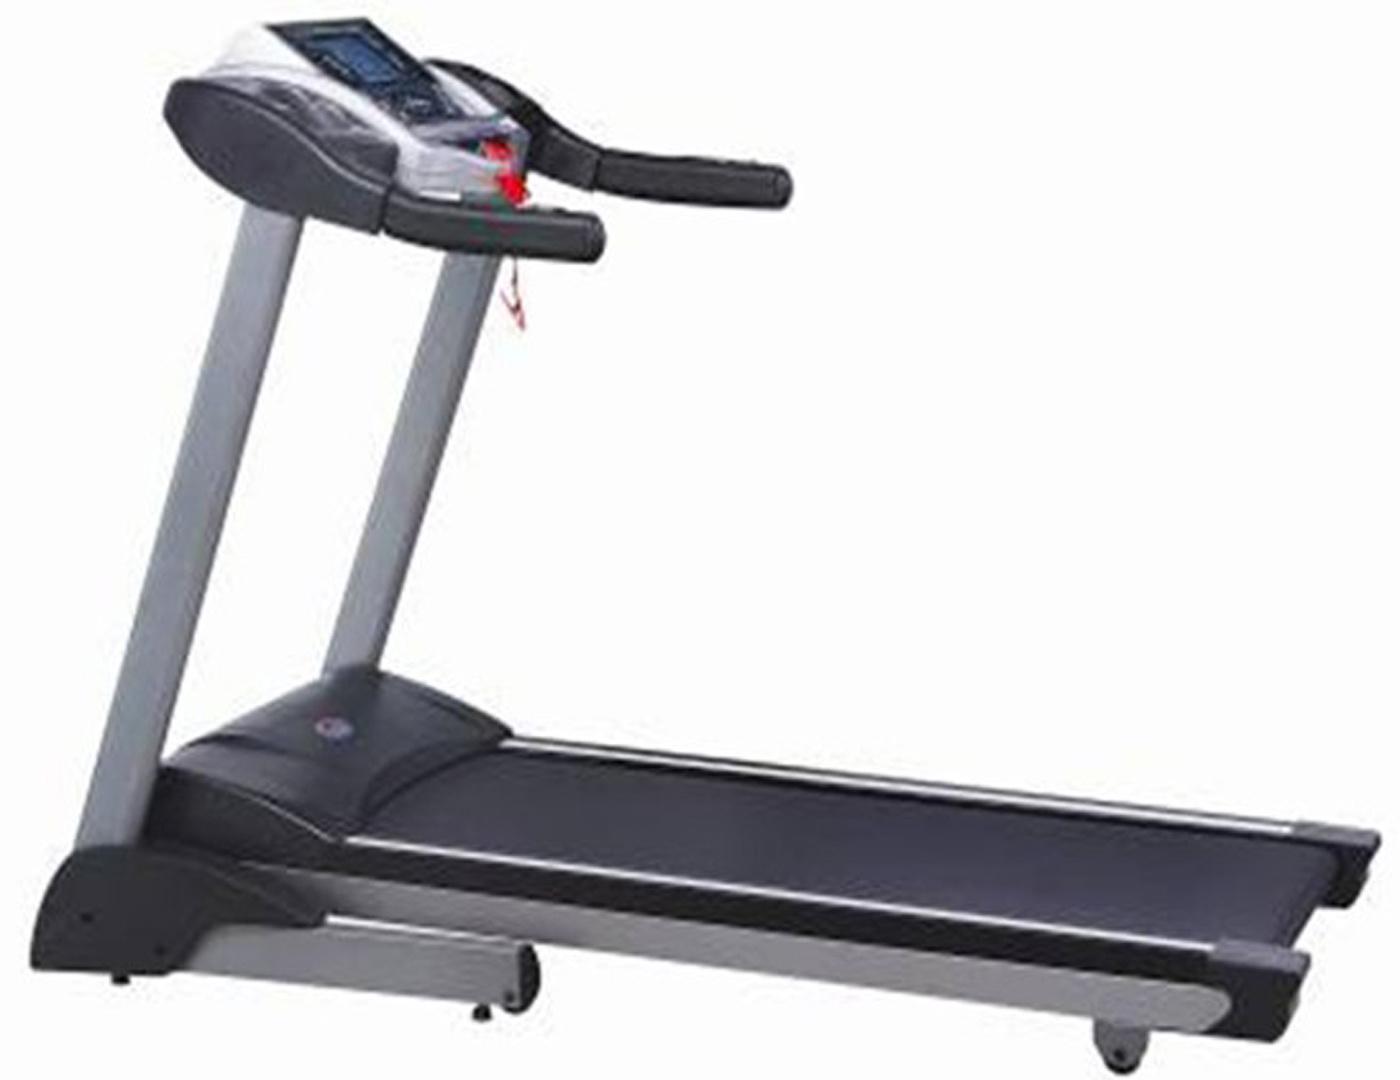 York fitness treadmill t101 manual